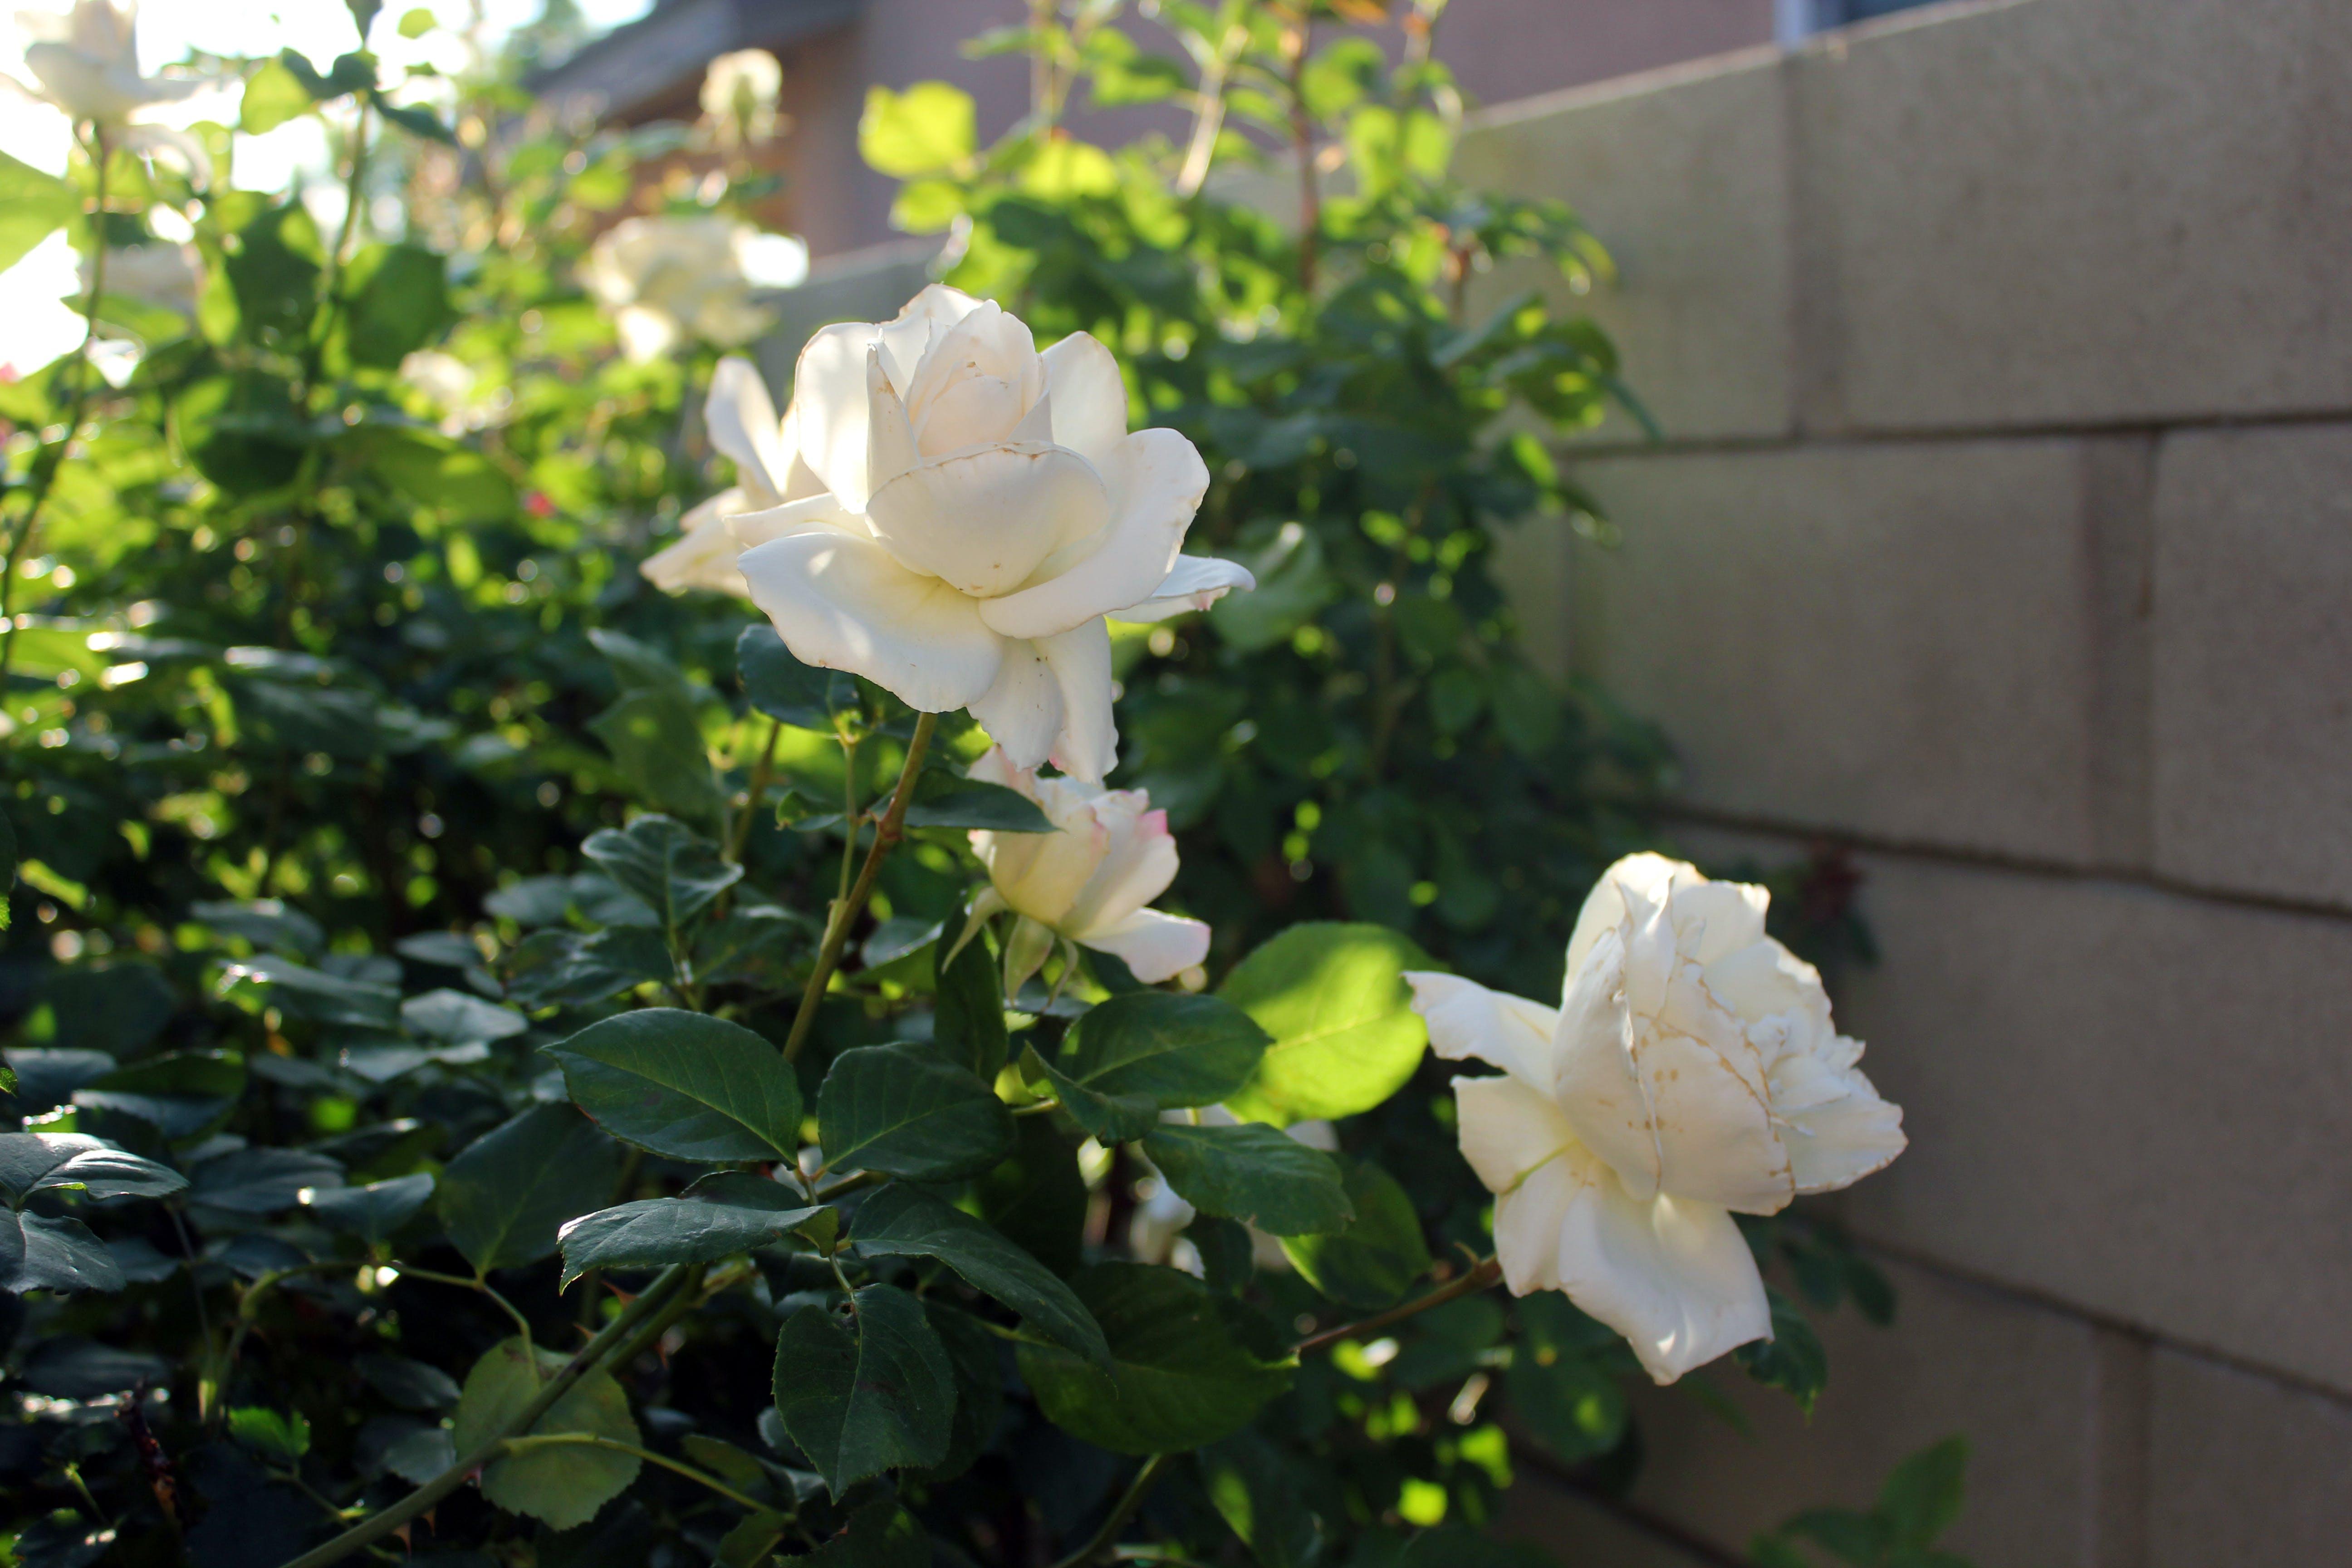 Free stock photo of white rose